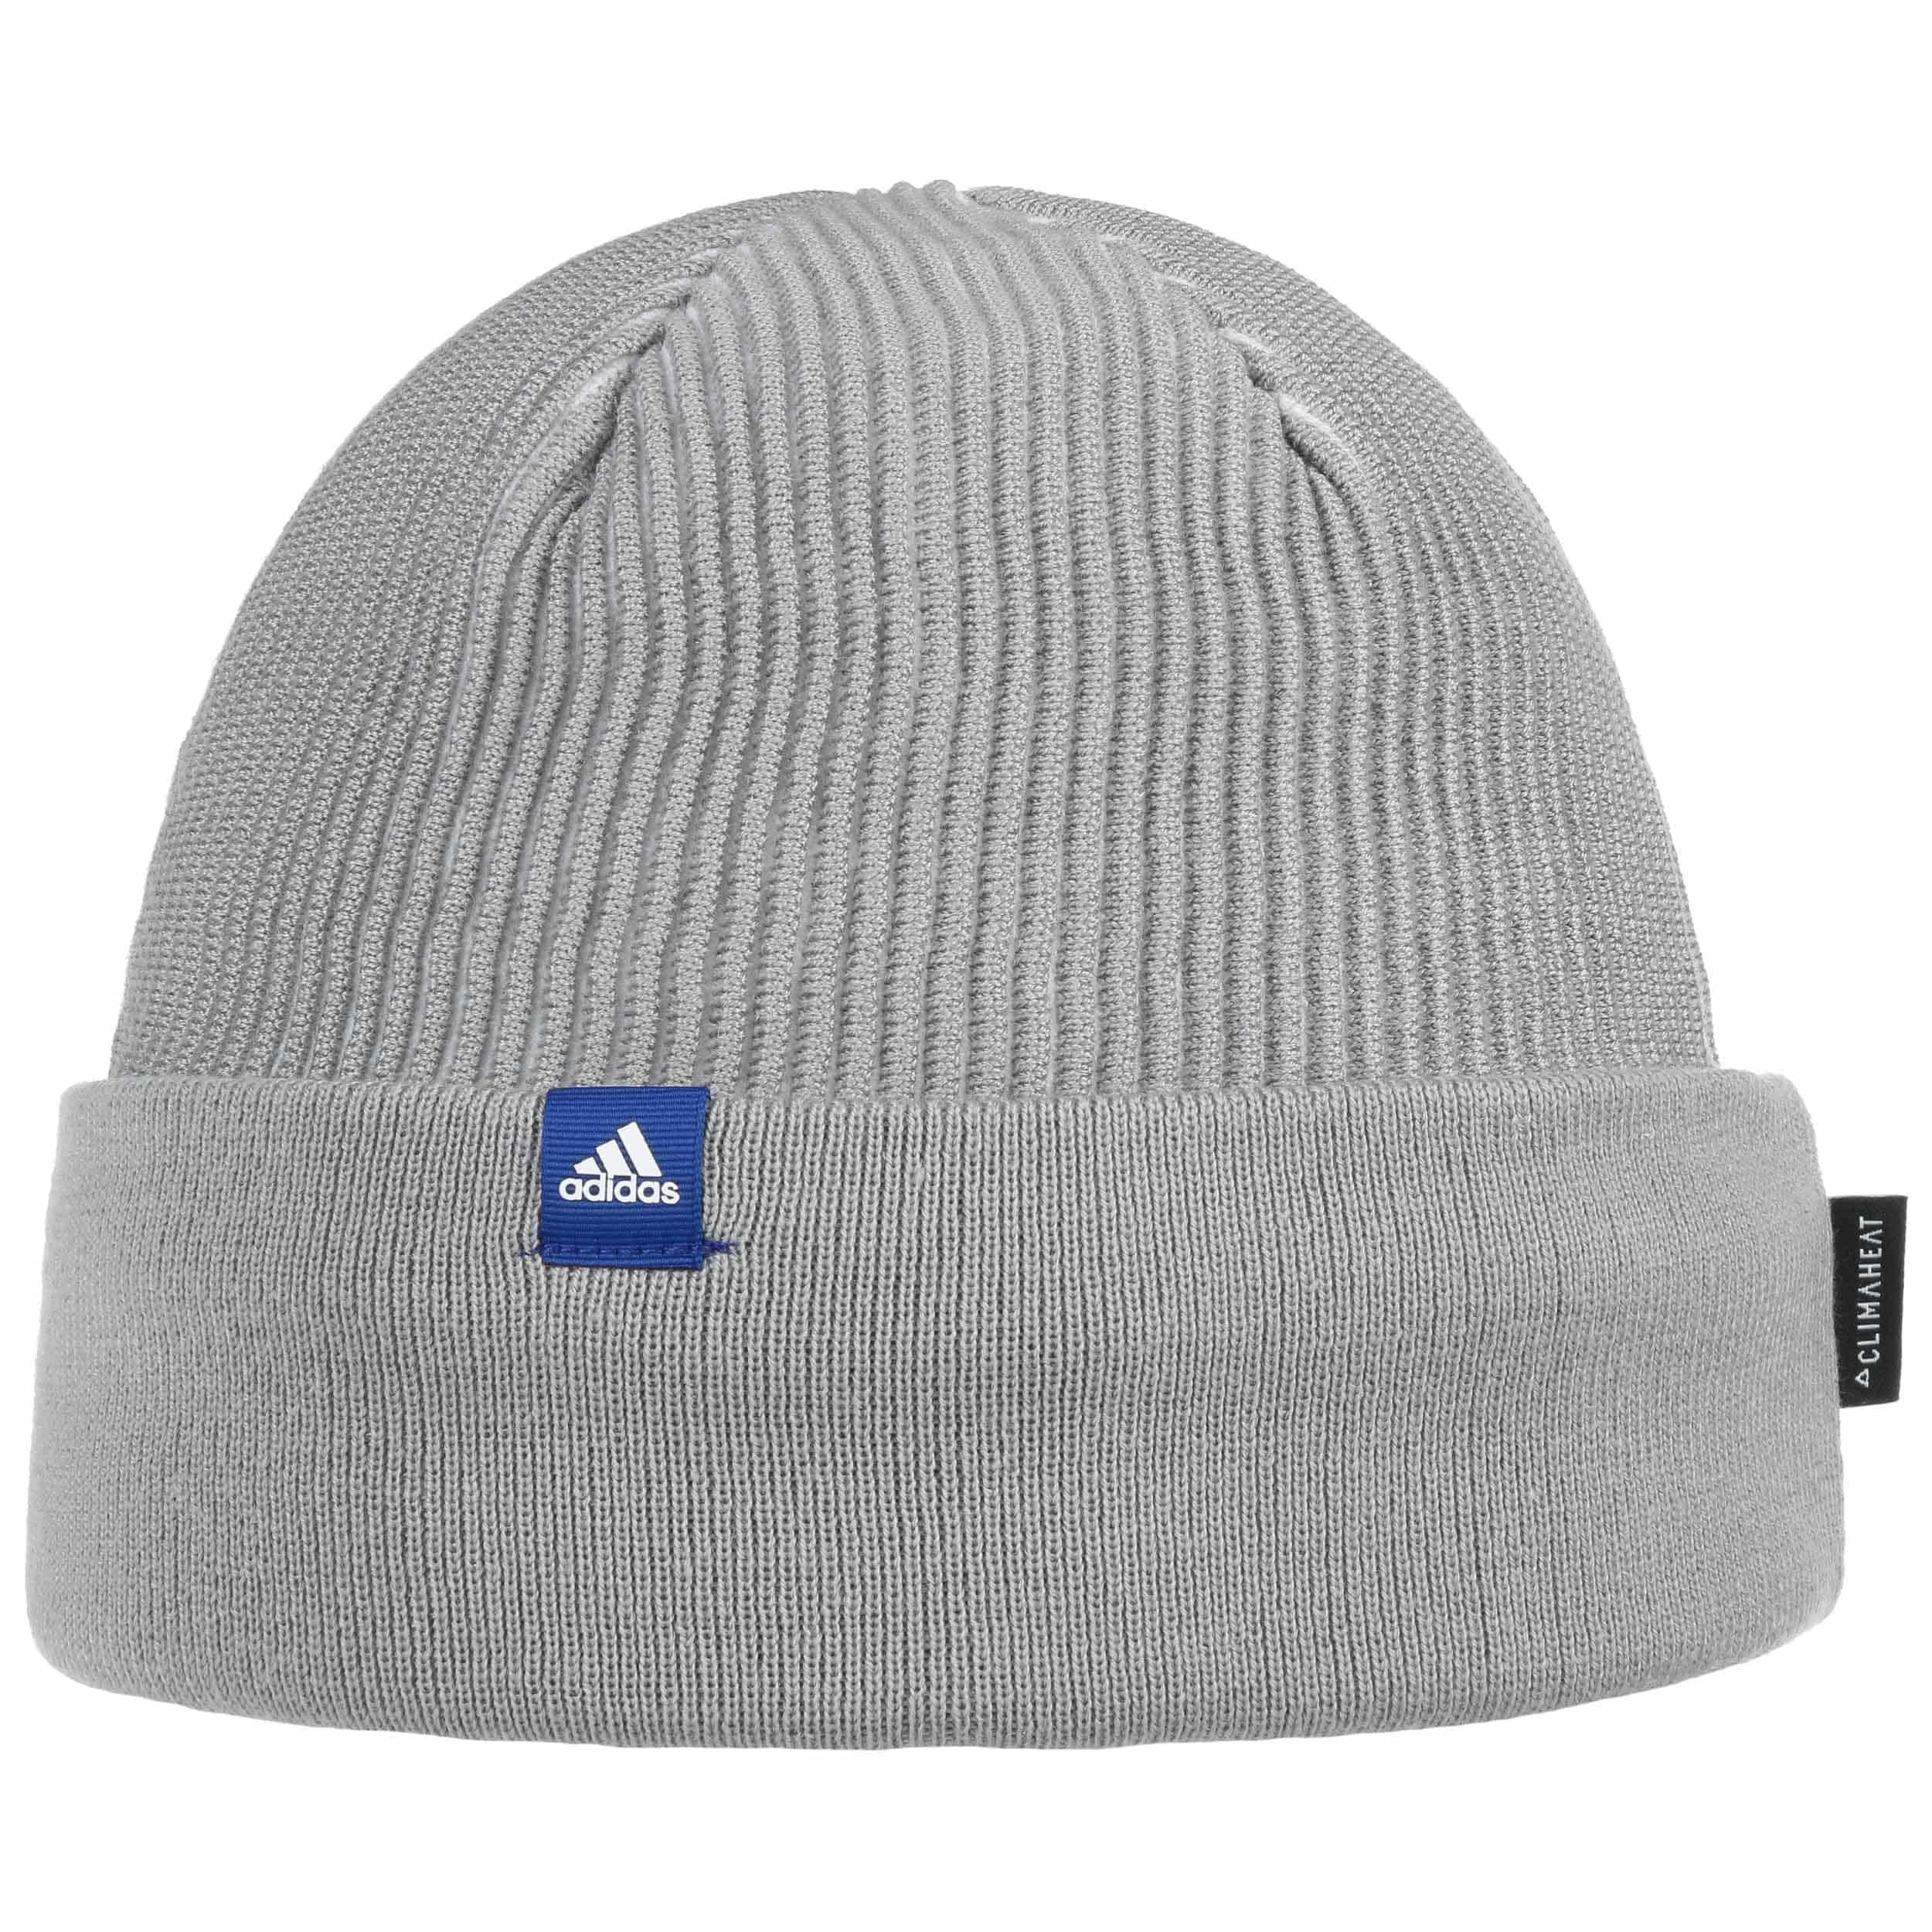 7eef5815b45 ... Climaheat Rib Beanie Hat by adidas - light grey 4 ...